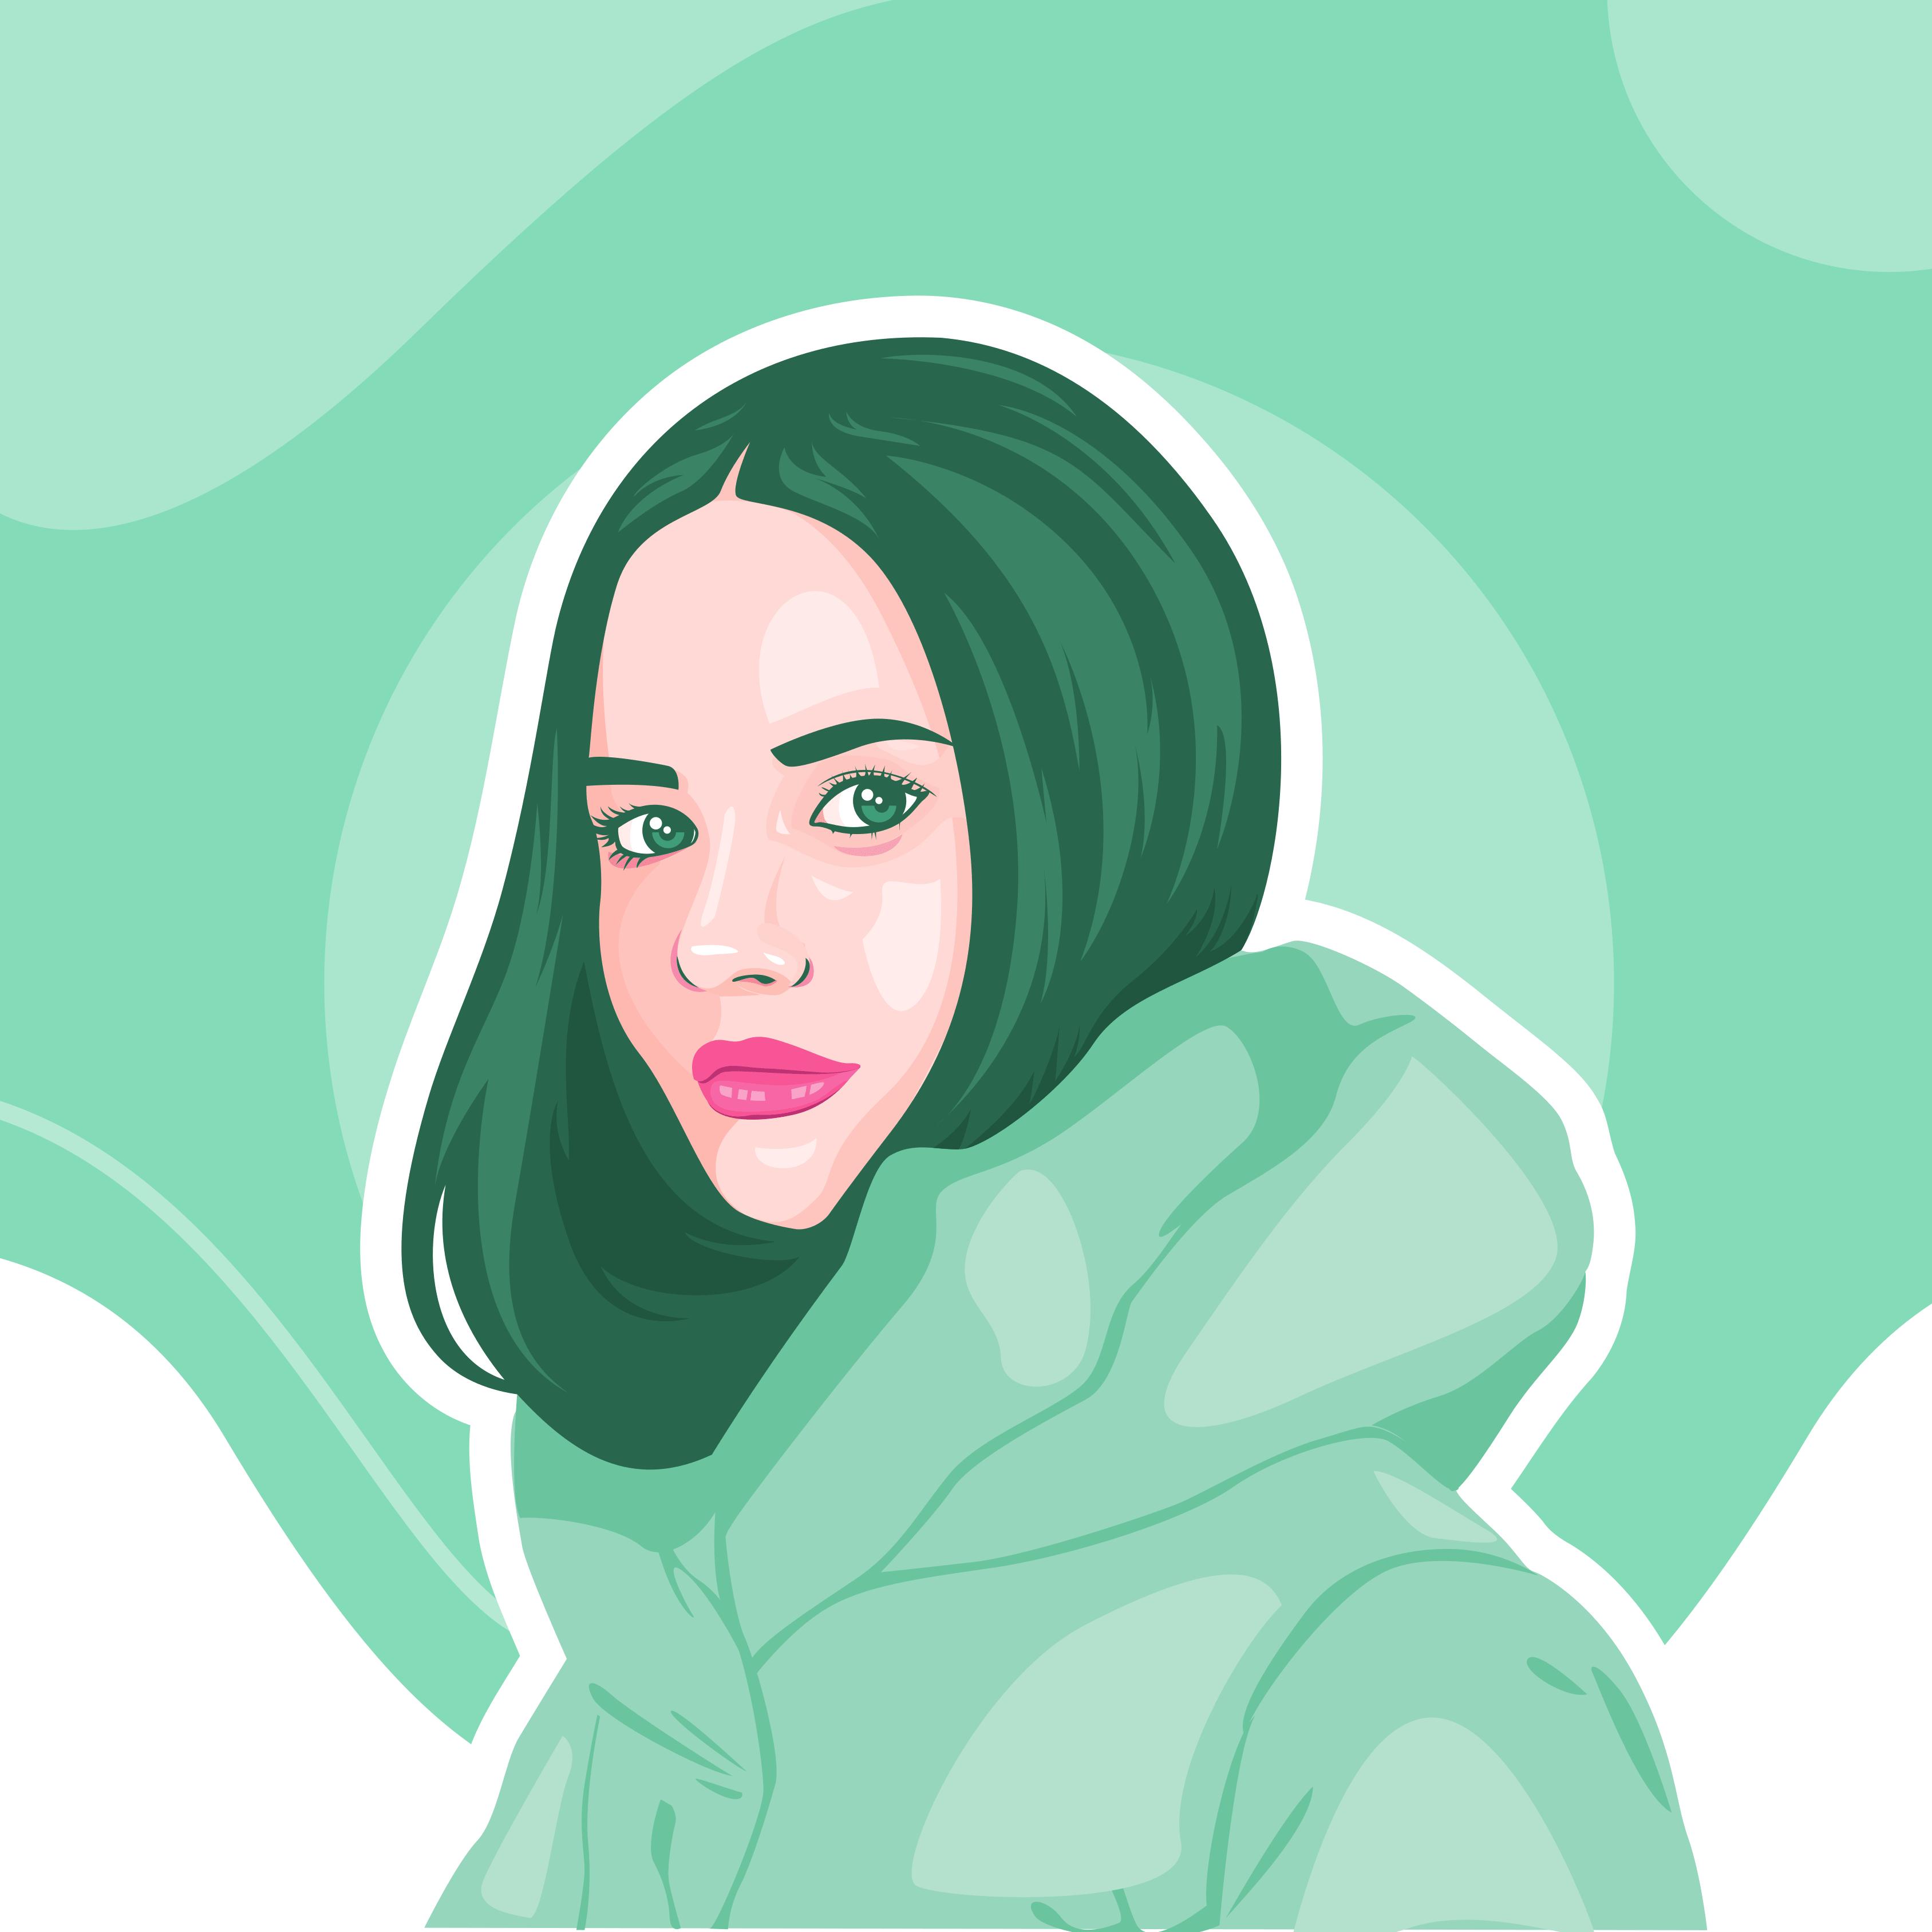 vector_potrait_illustration_zakeydesign.com